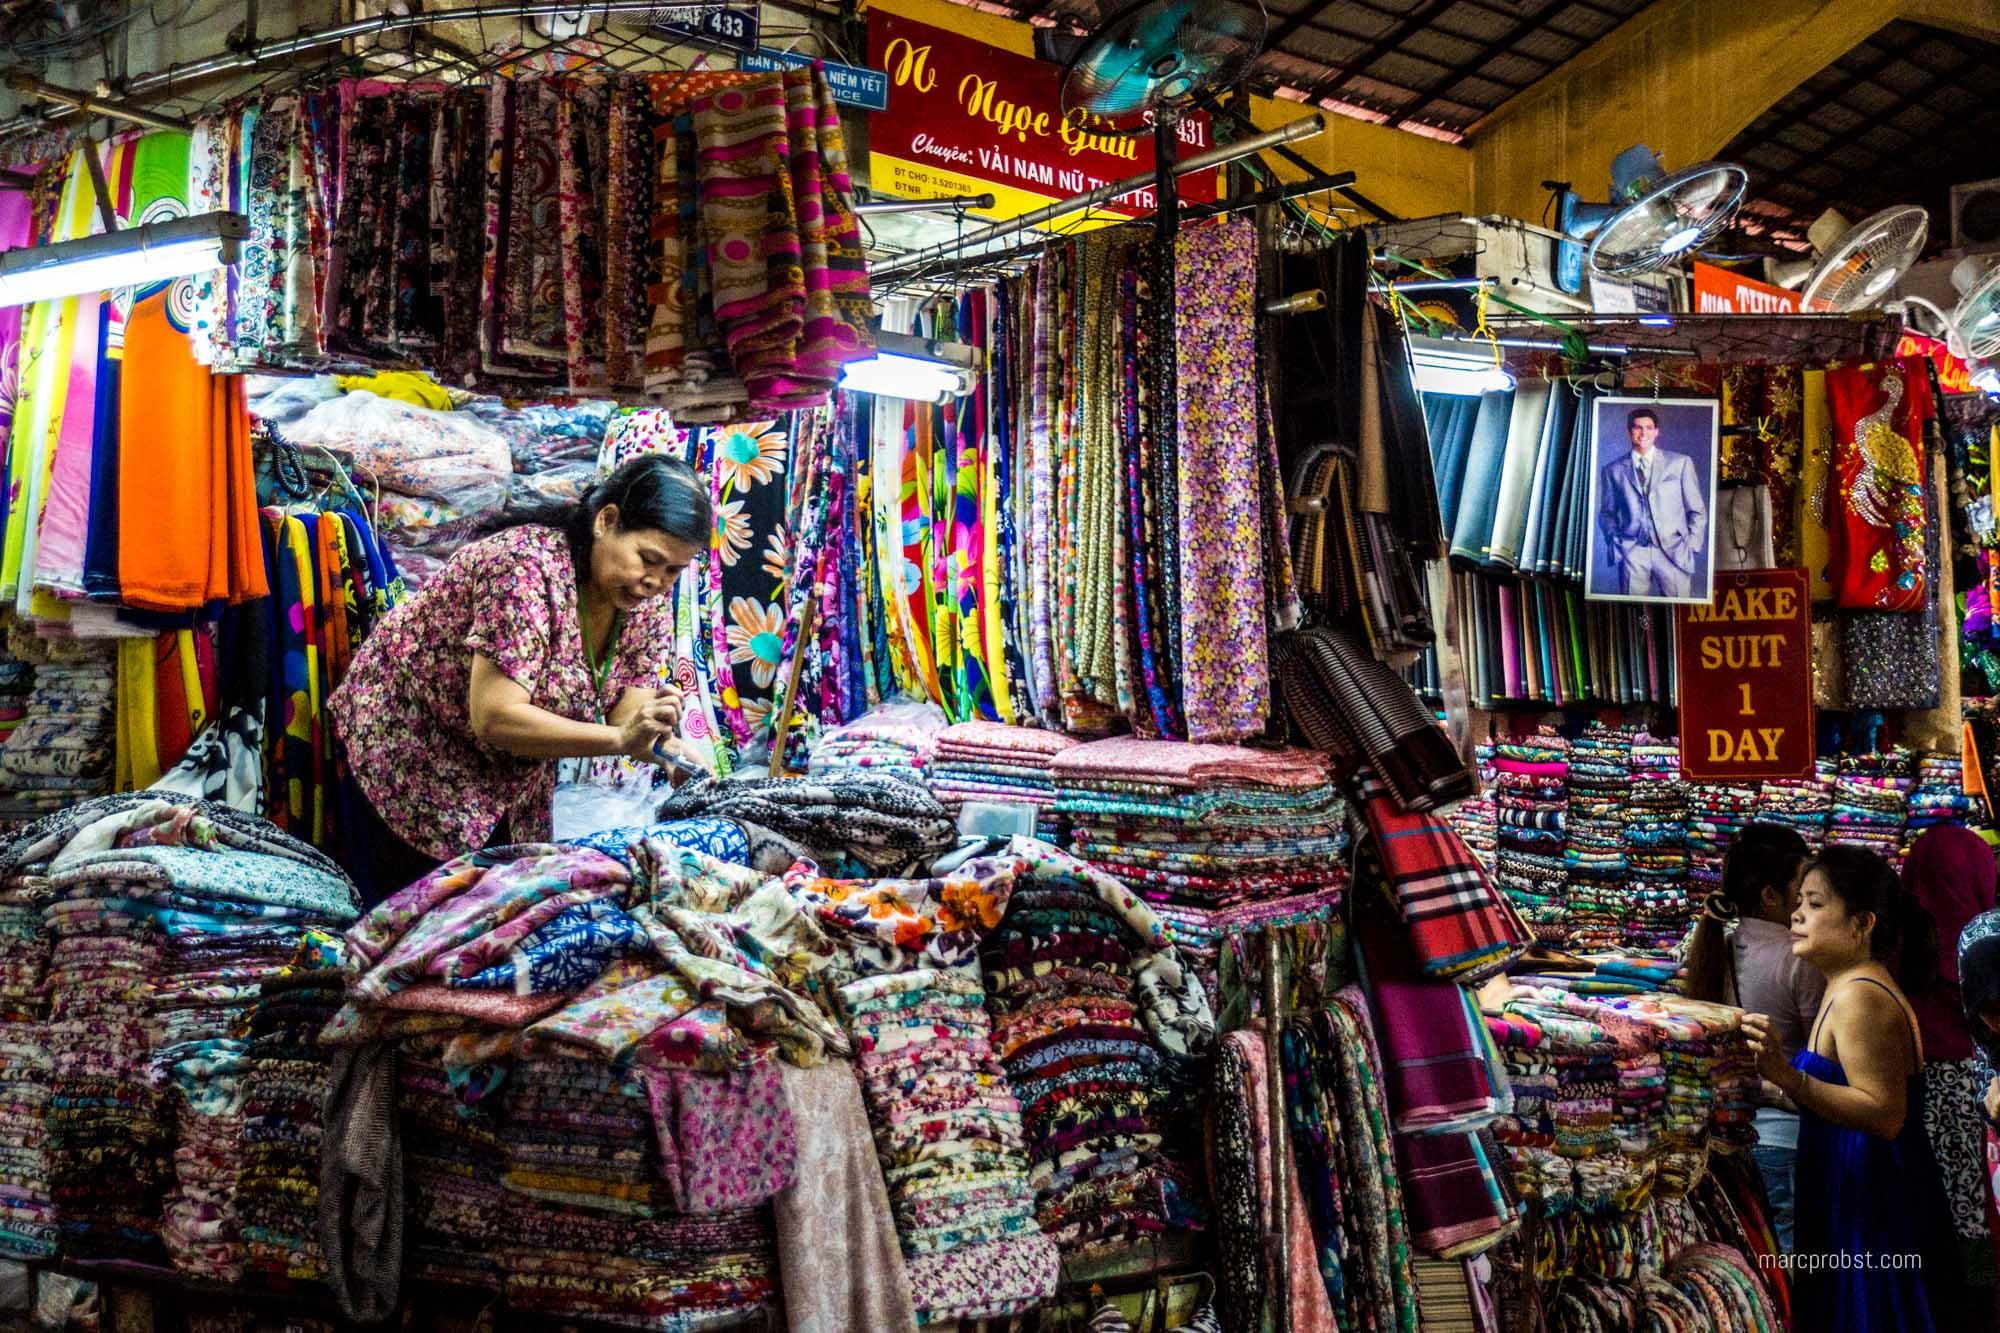 Markt in Ho-Chi-Minh-City im Vietnam